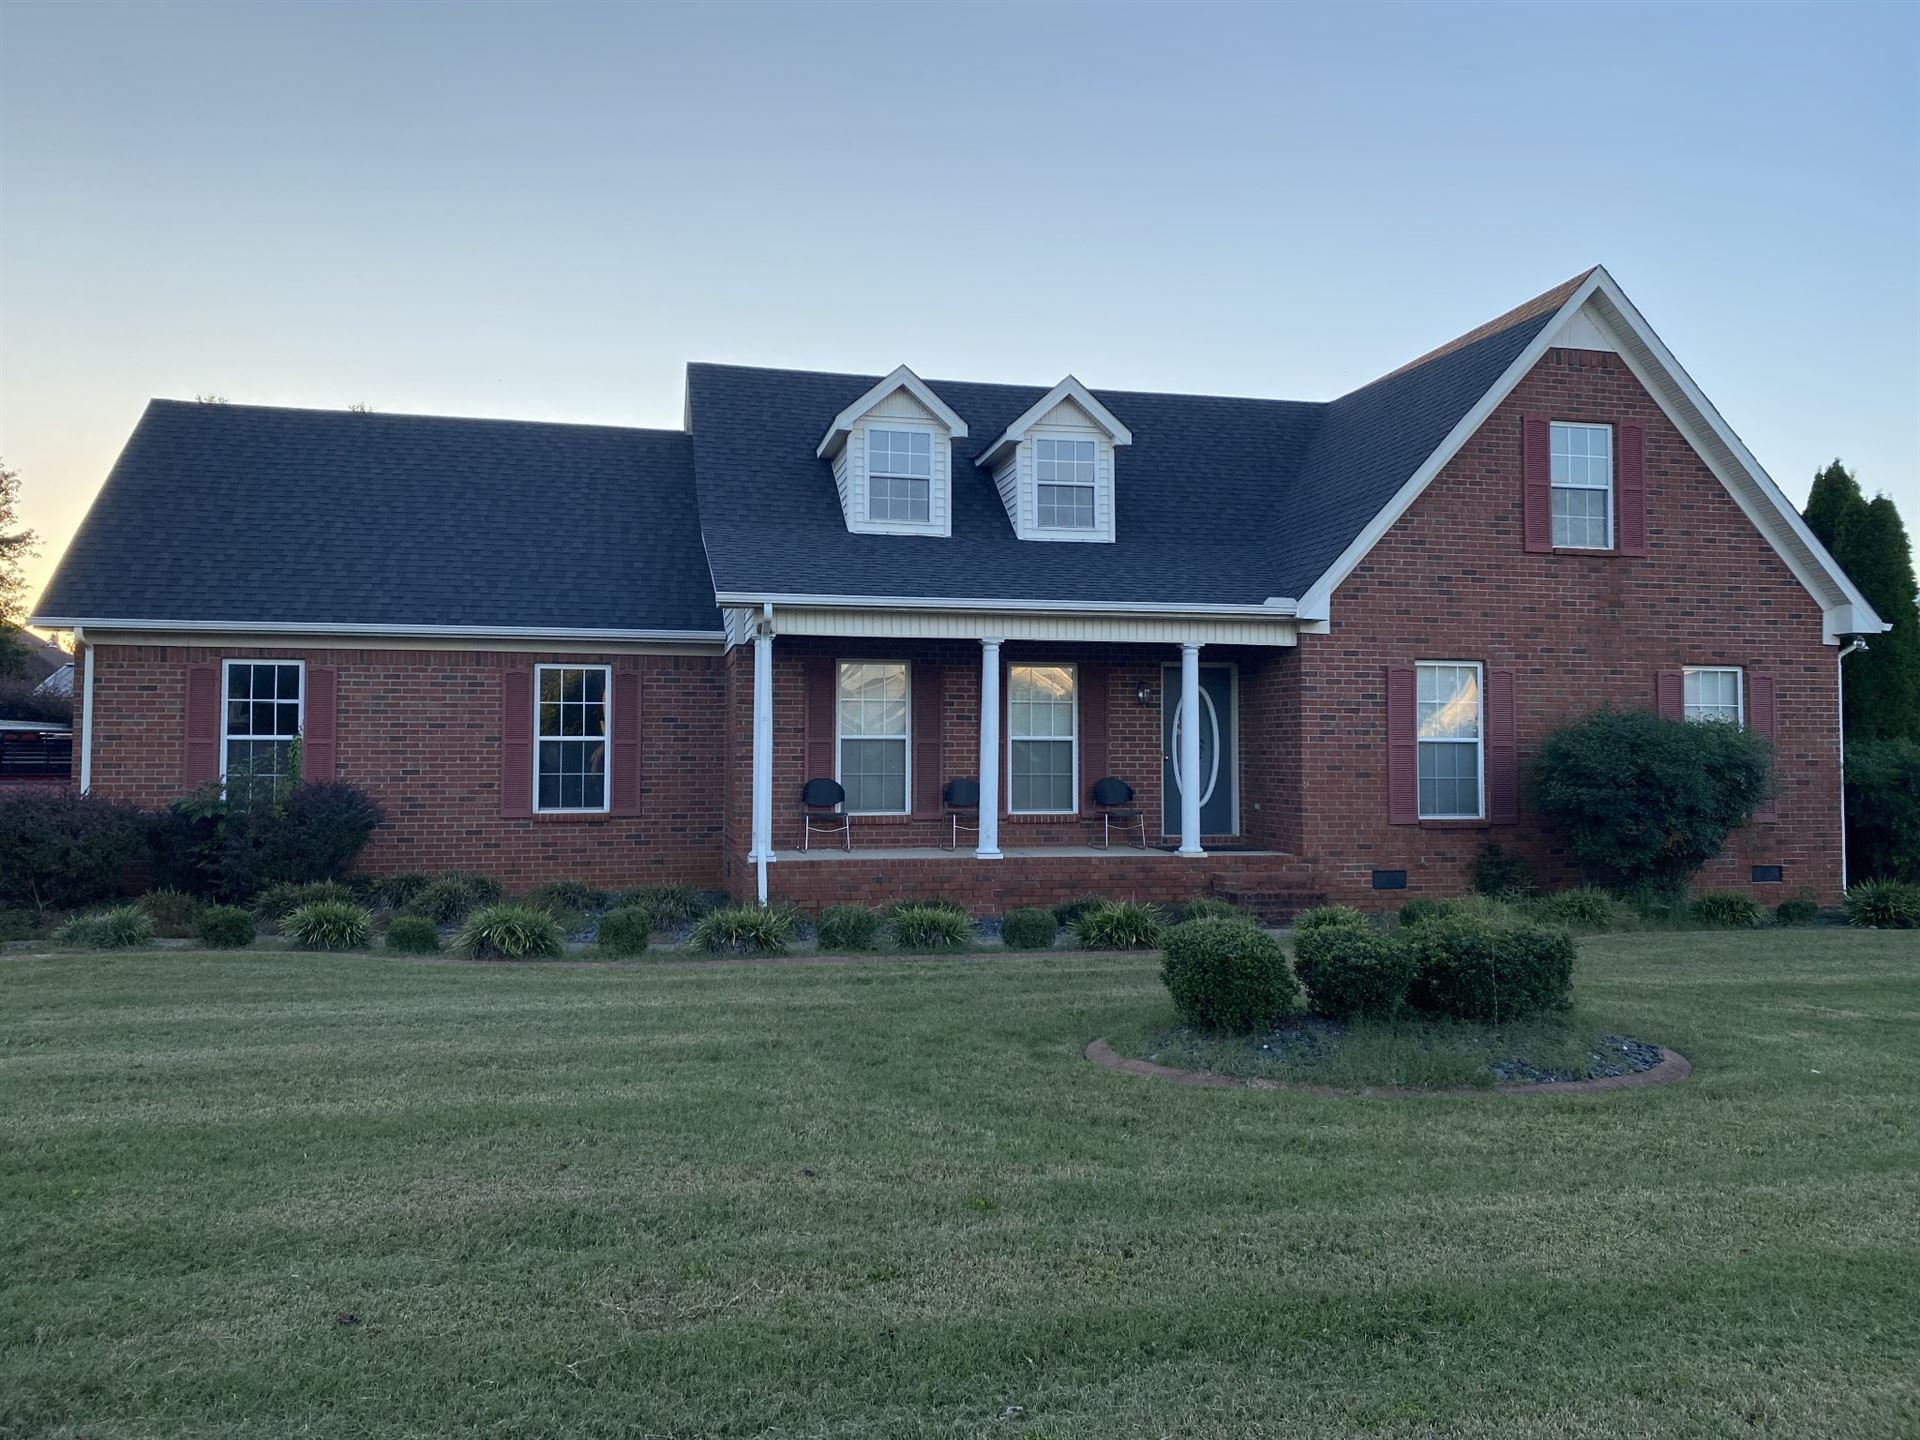 Photo of 3315 Meadowhill Drive, Murfreesboro, TN 37130 (MLS # 2299681)